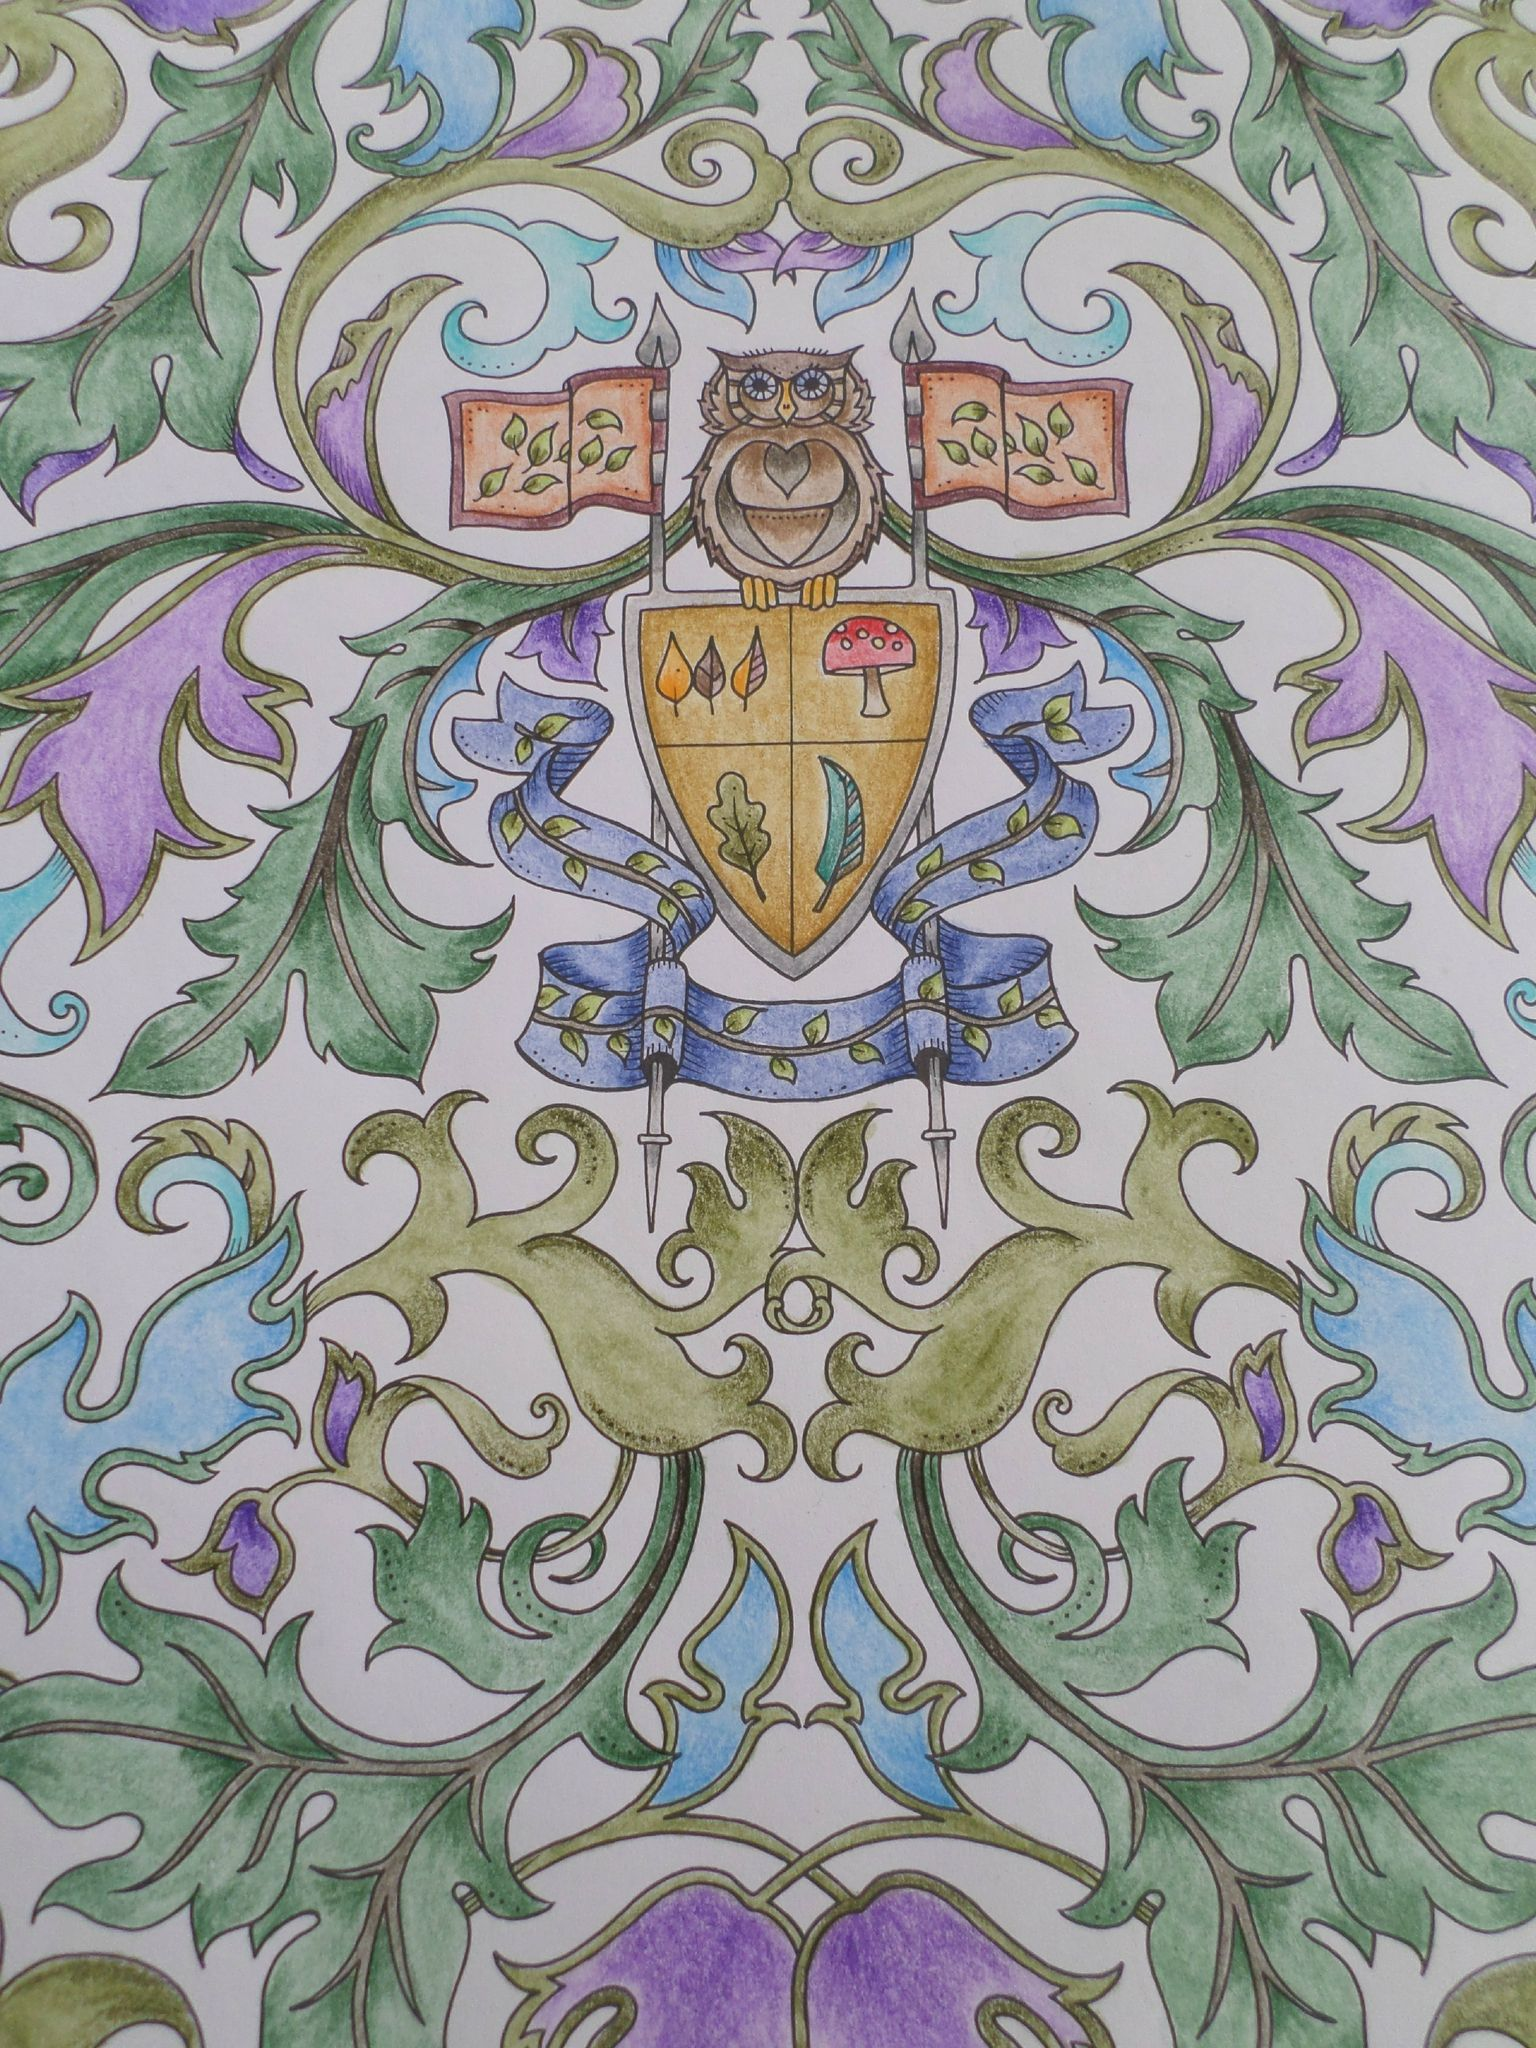 Livre Foret Enchantee Steffy Elsass Crea Coloring Foret